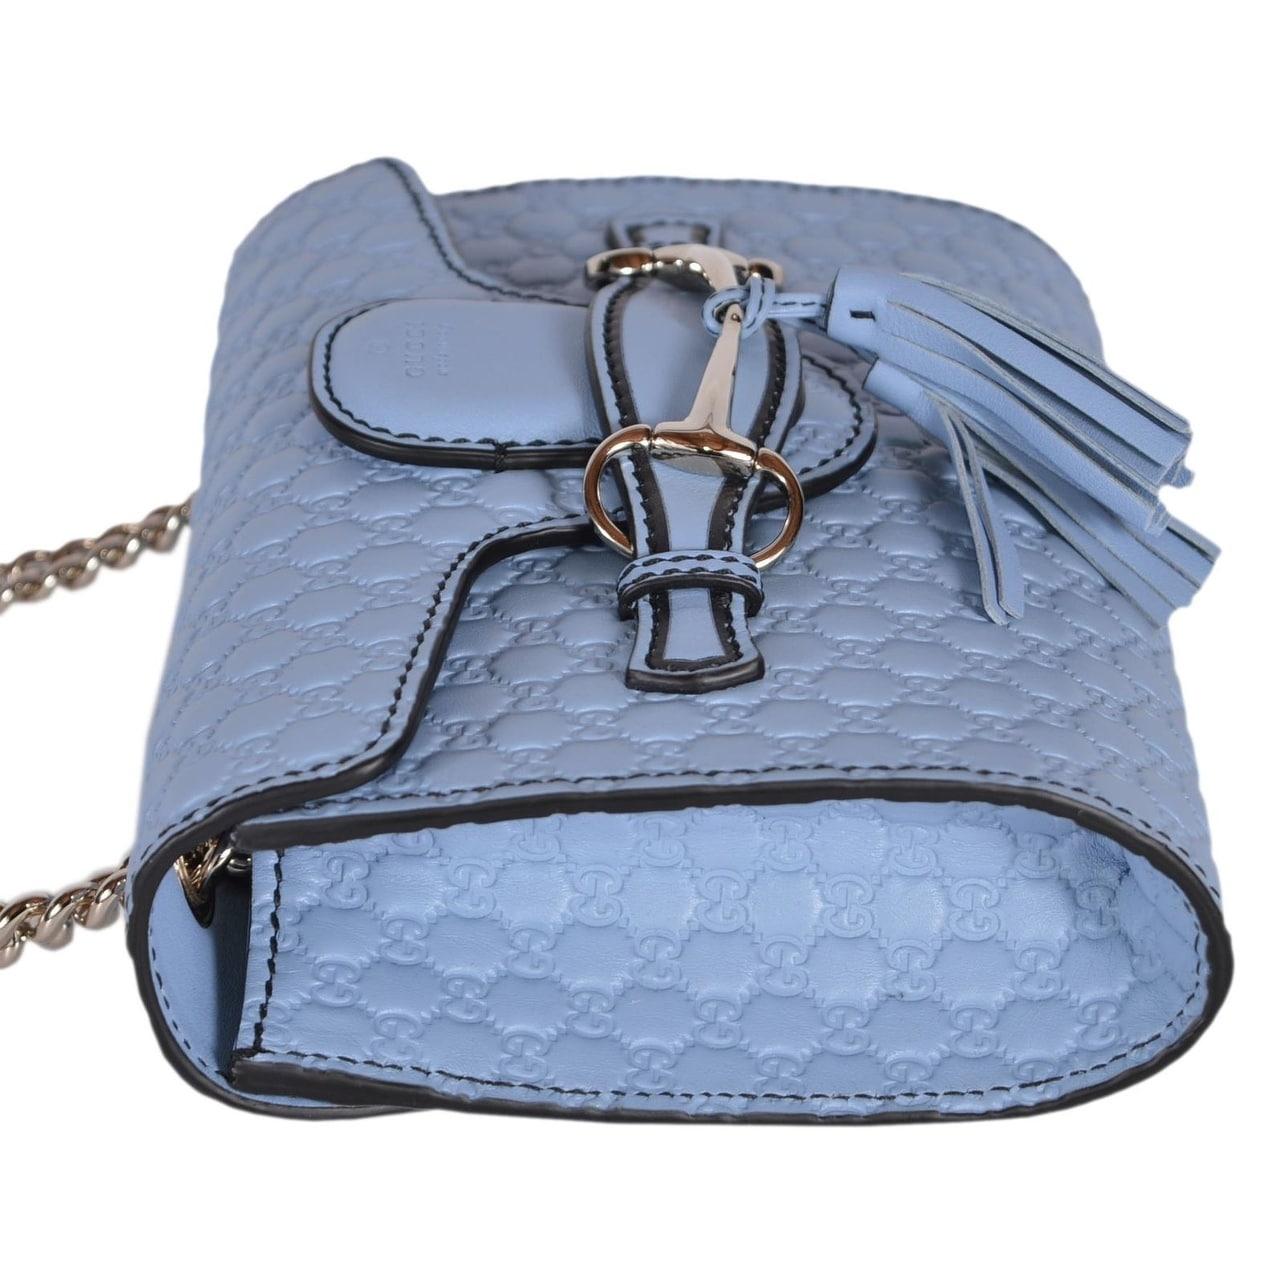 f6f93f6ad24c Shop Gucci 449636 Blue Micro GG Guccissima Leather MINI Emily Crossbody  Purse Bag - On Sale - Free Shipping Today - Overstock - 18106232